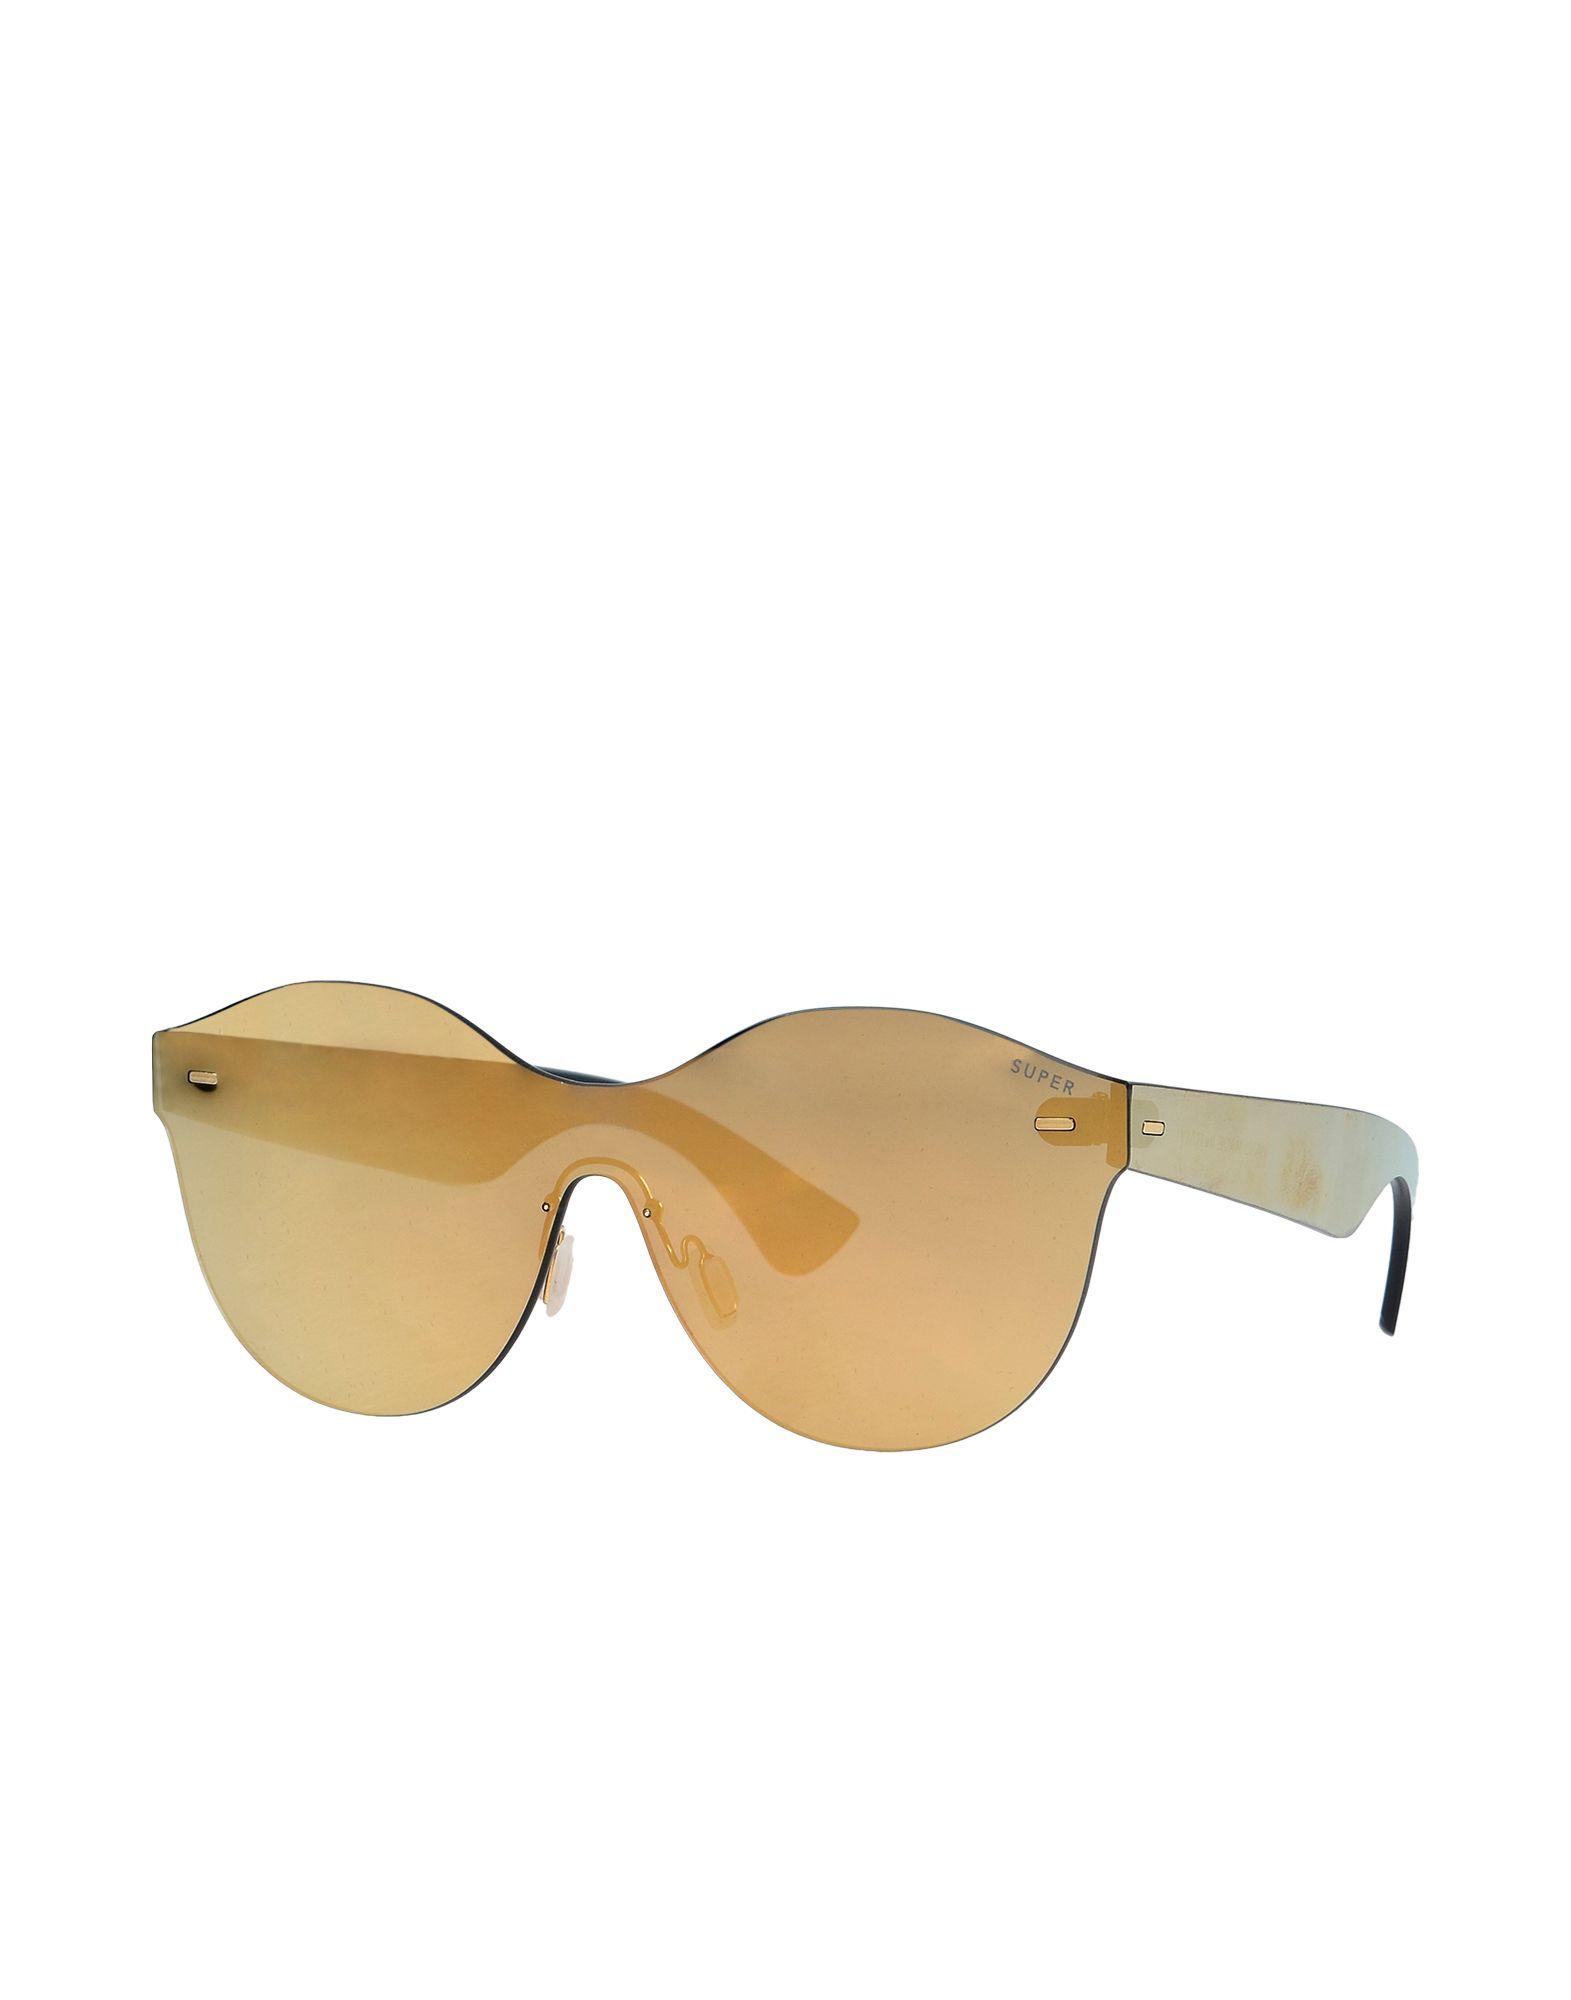 Фото - SUPER by RETROSUPERFUTURE Солнечные очки 3d очки